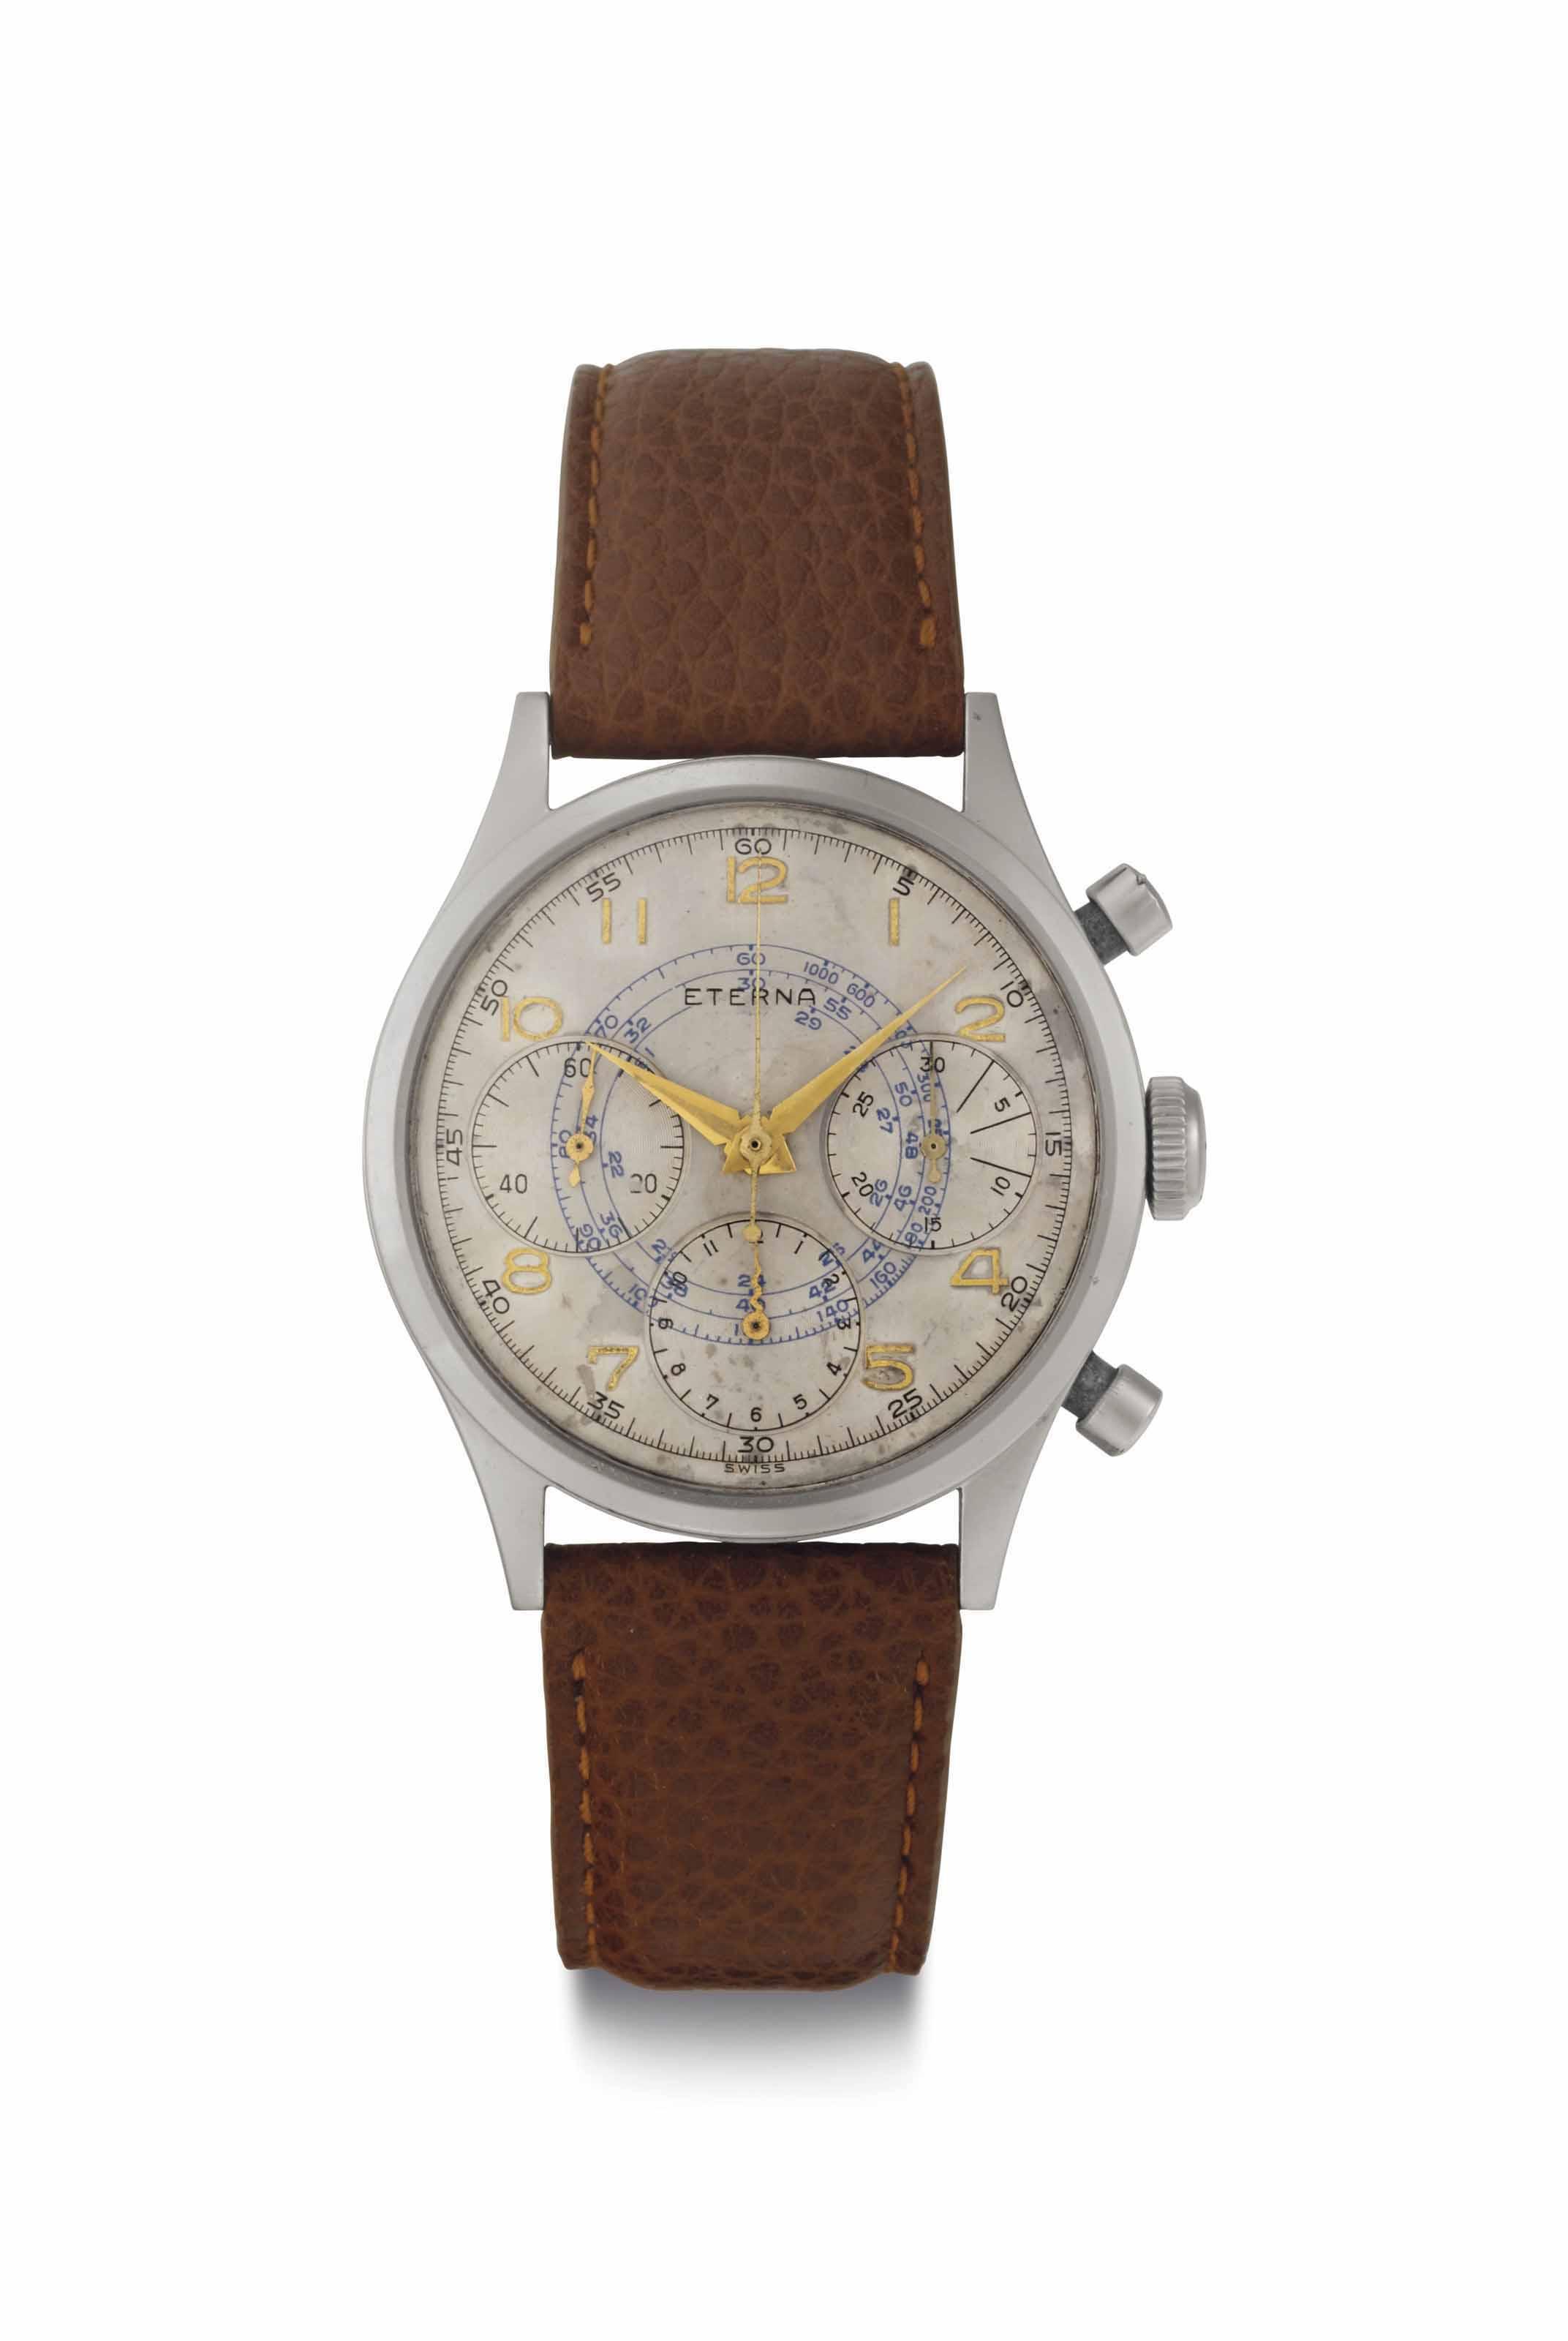 Eterna. A Fine Stainless Steel Chronograph Wristwatch